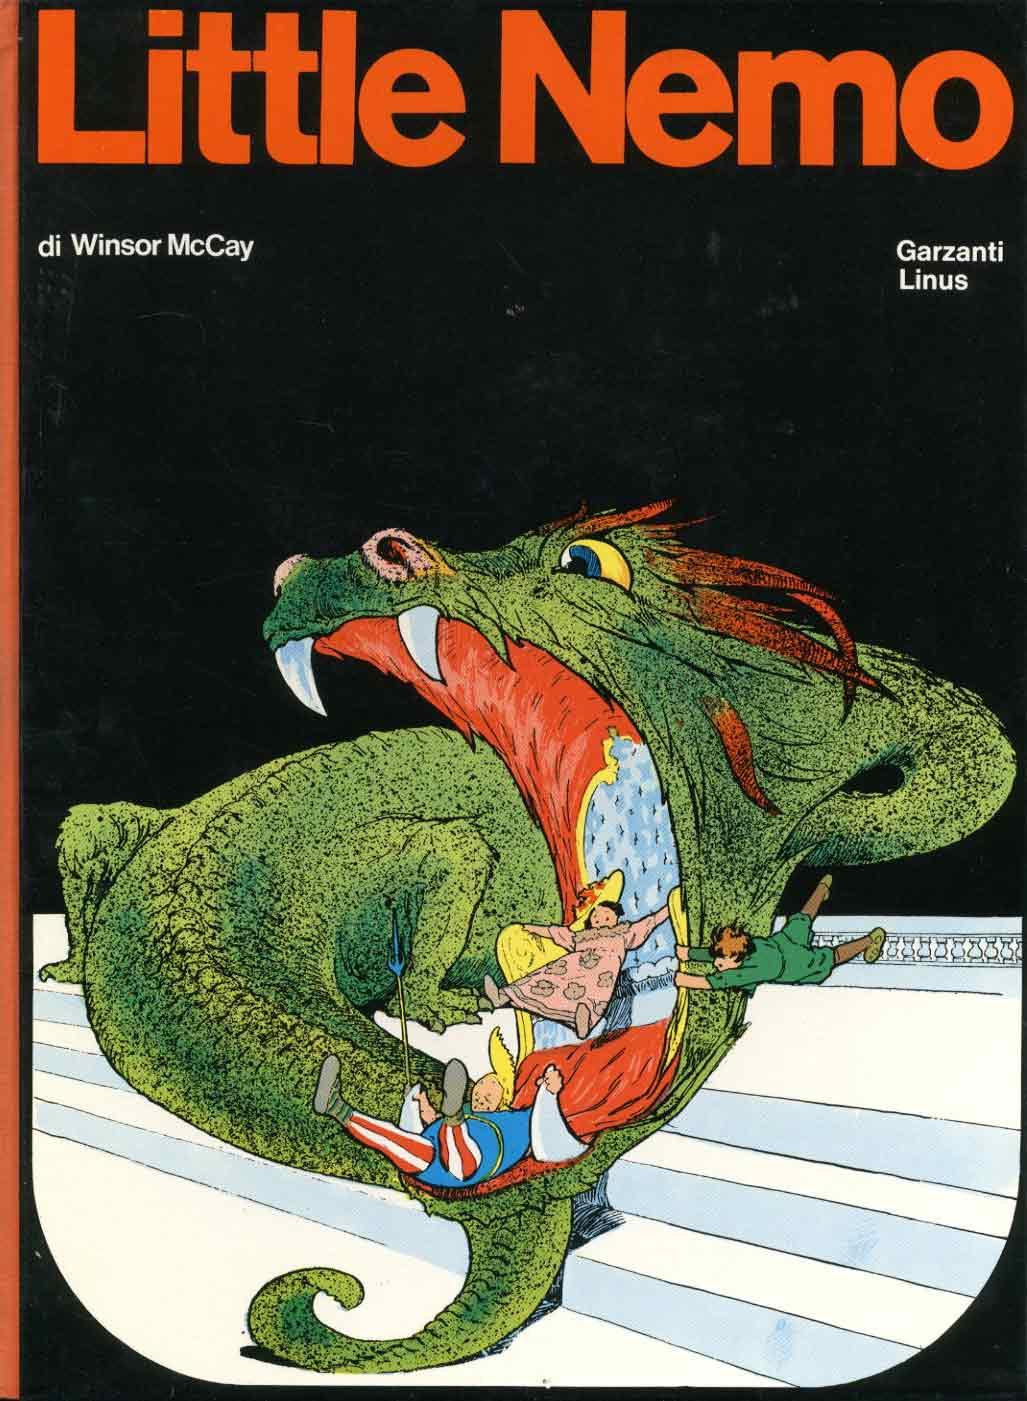 Winsor McCay – Little Nemo_Essential 300 comics